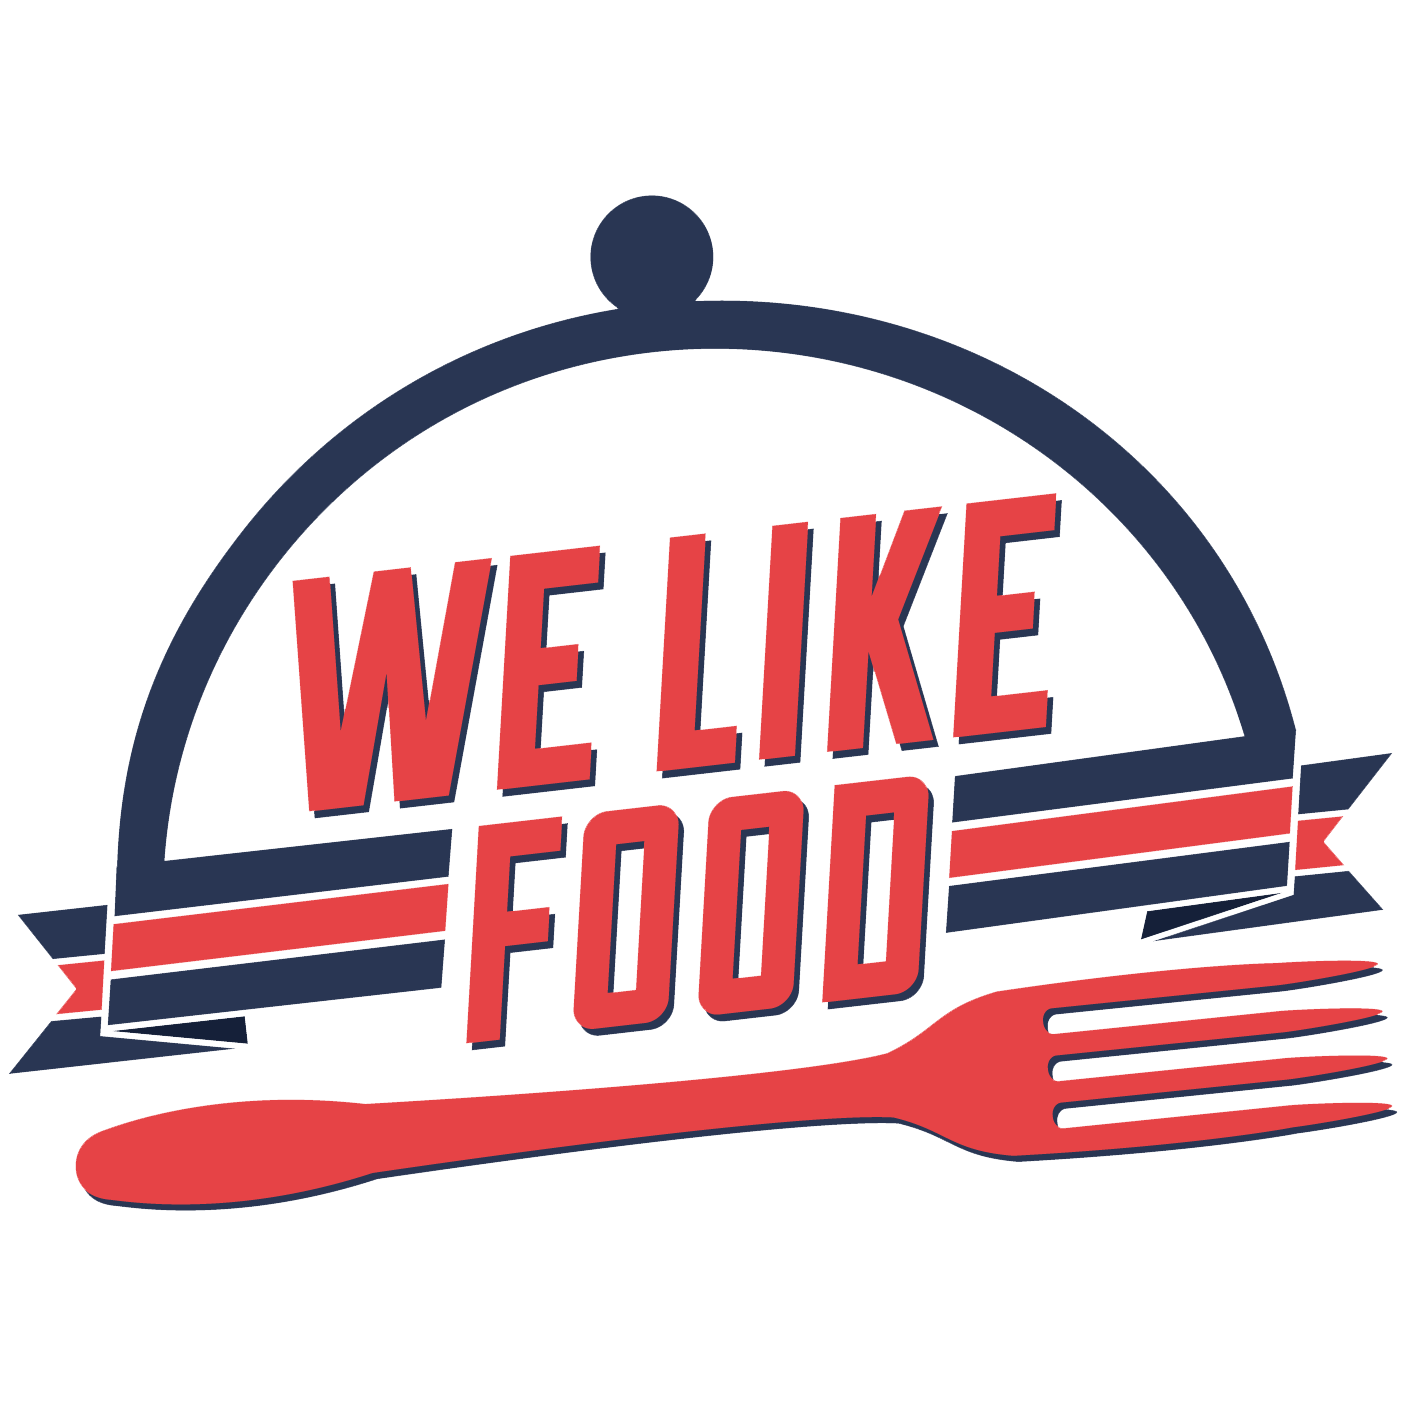 vector freeuse Fridge clipart food house. We like